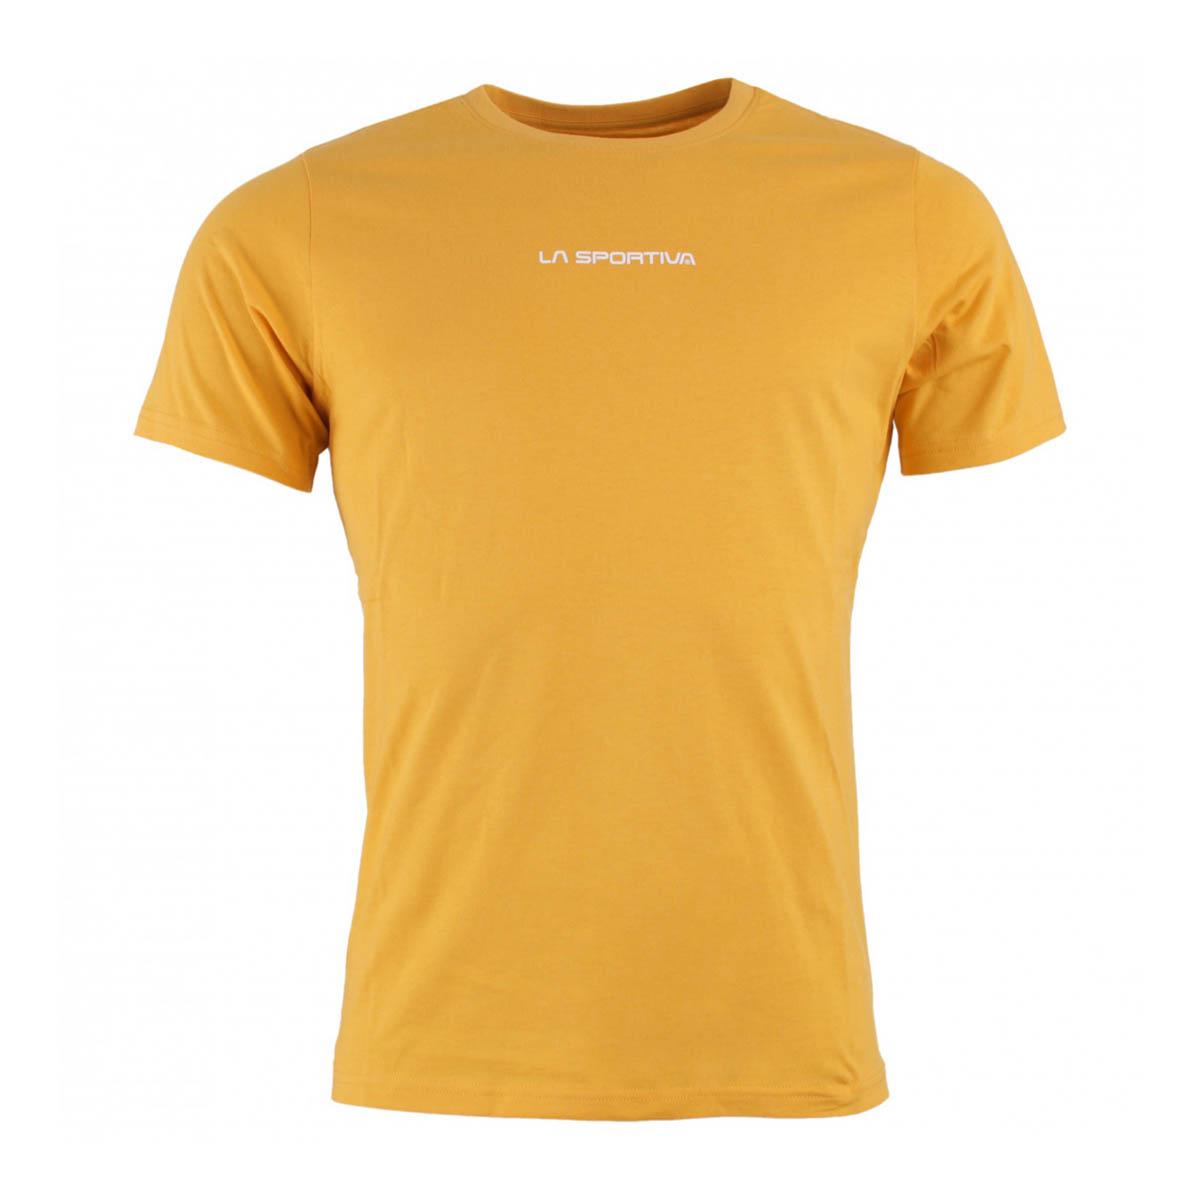 800a5454663 La Sportiva Oldies Tee 2.0 | T Shirts, Shirts & Tops | EpicTV Shop